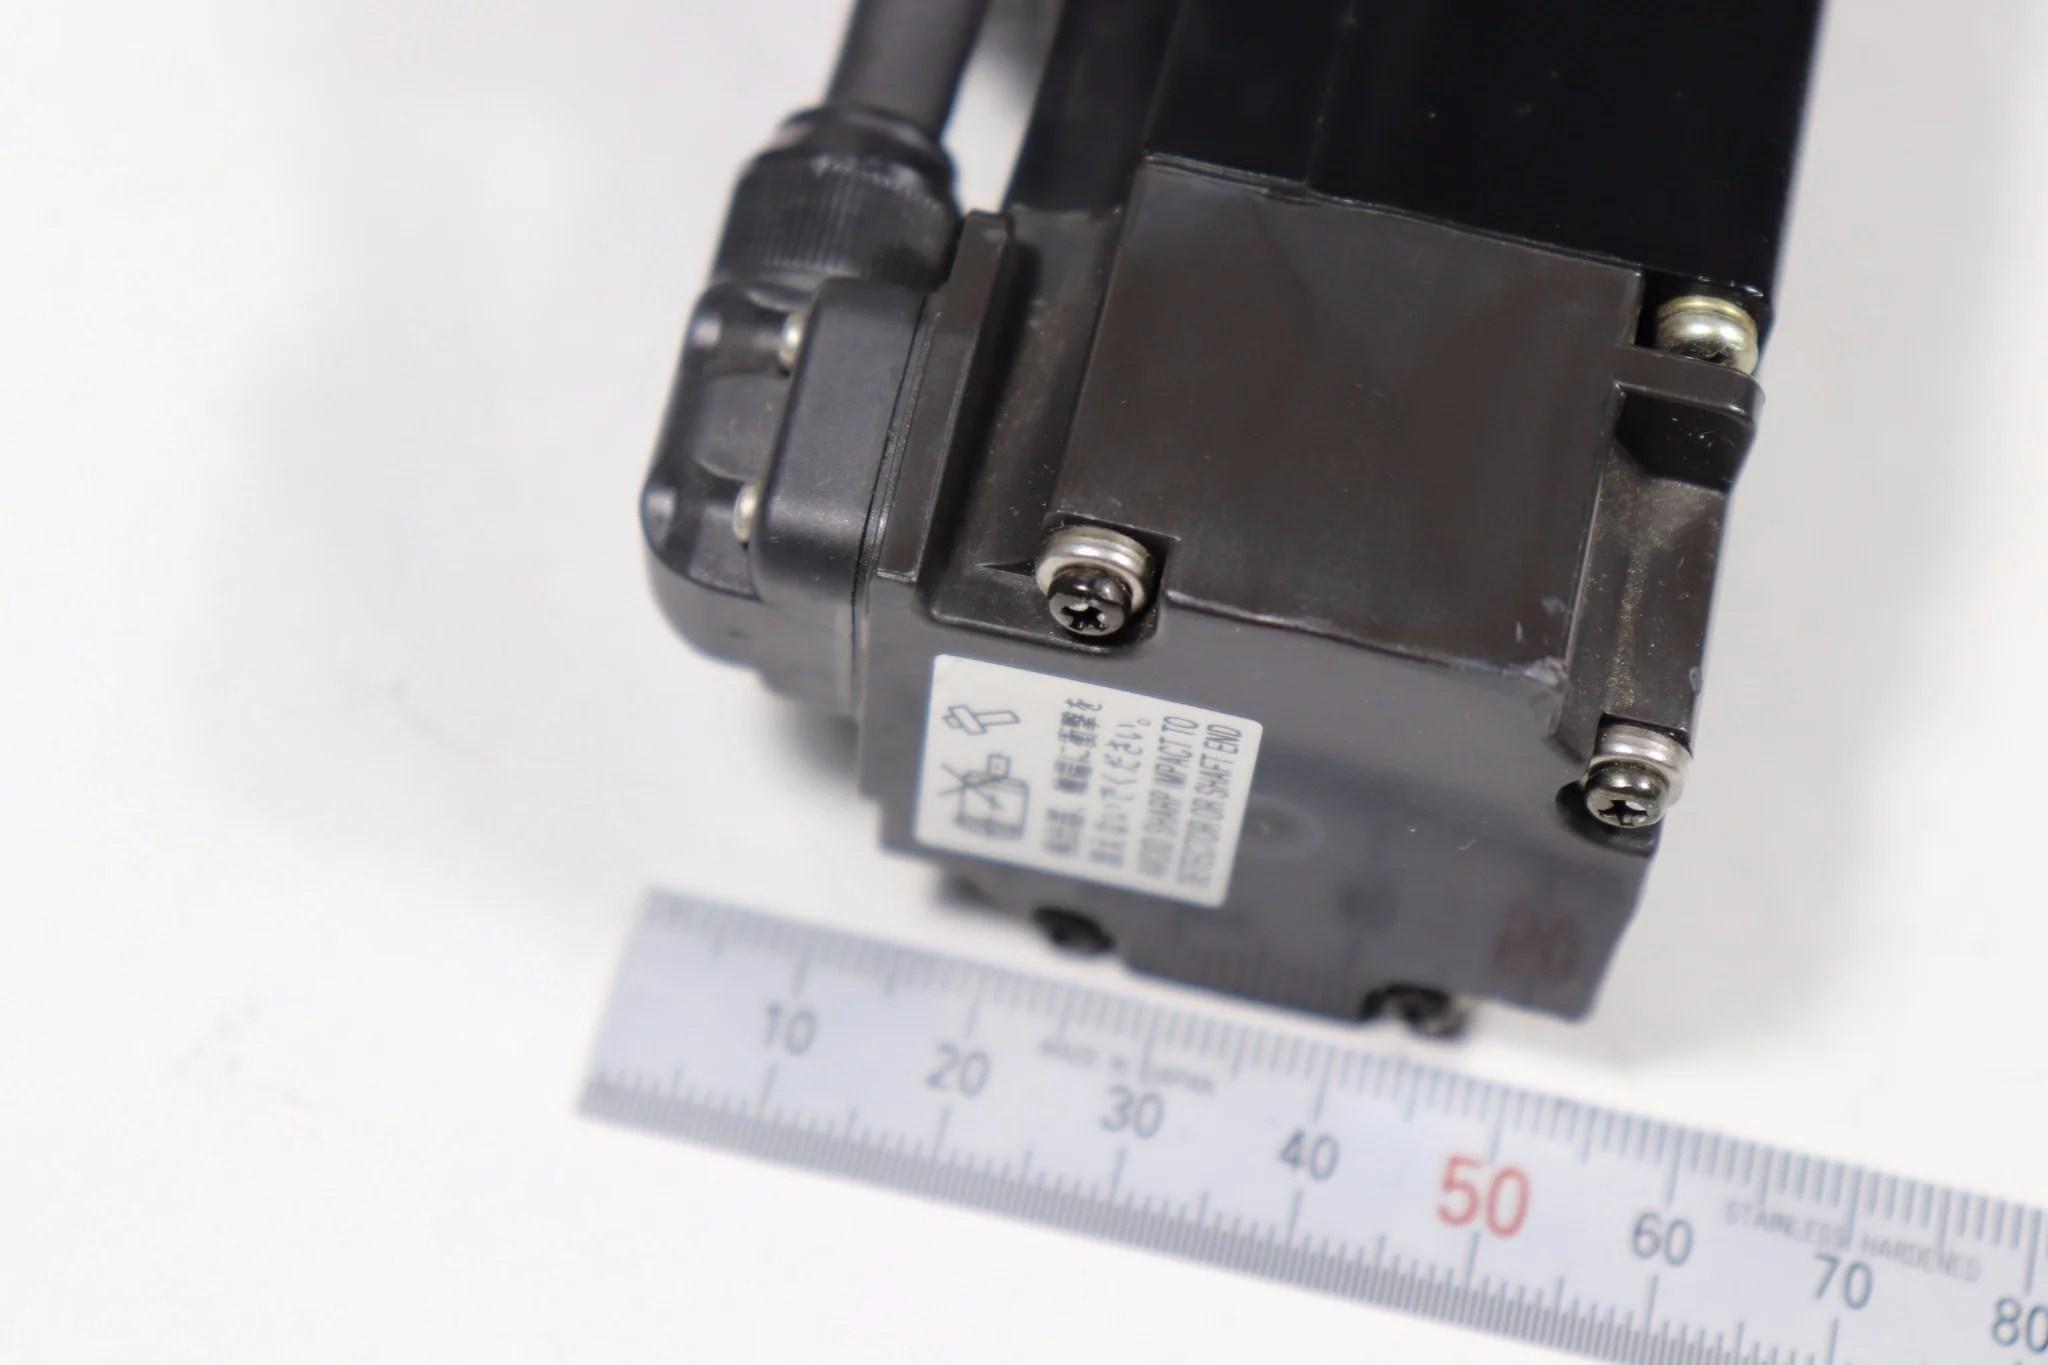 medium resolution of  mitsubishi mr j3 10b hf kp053b melservo ac servo driver brake